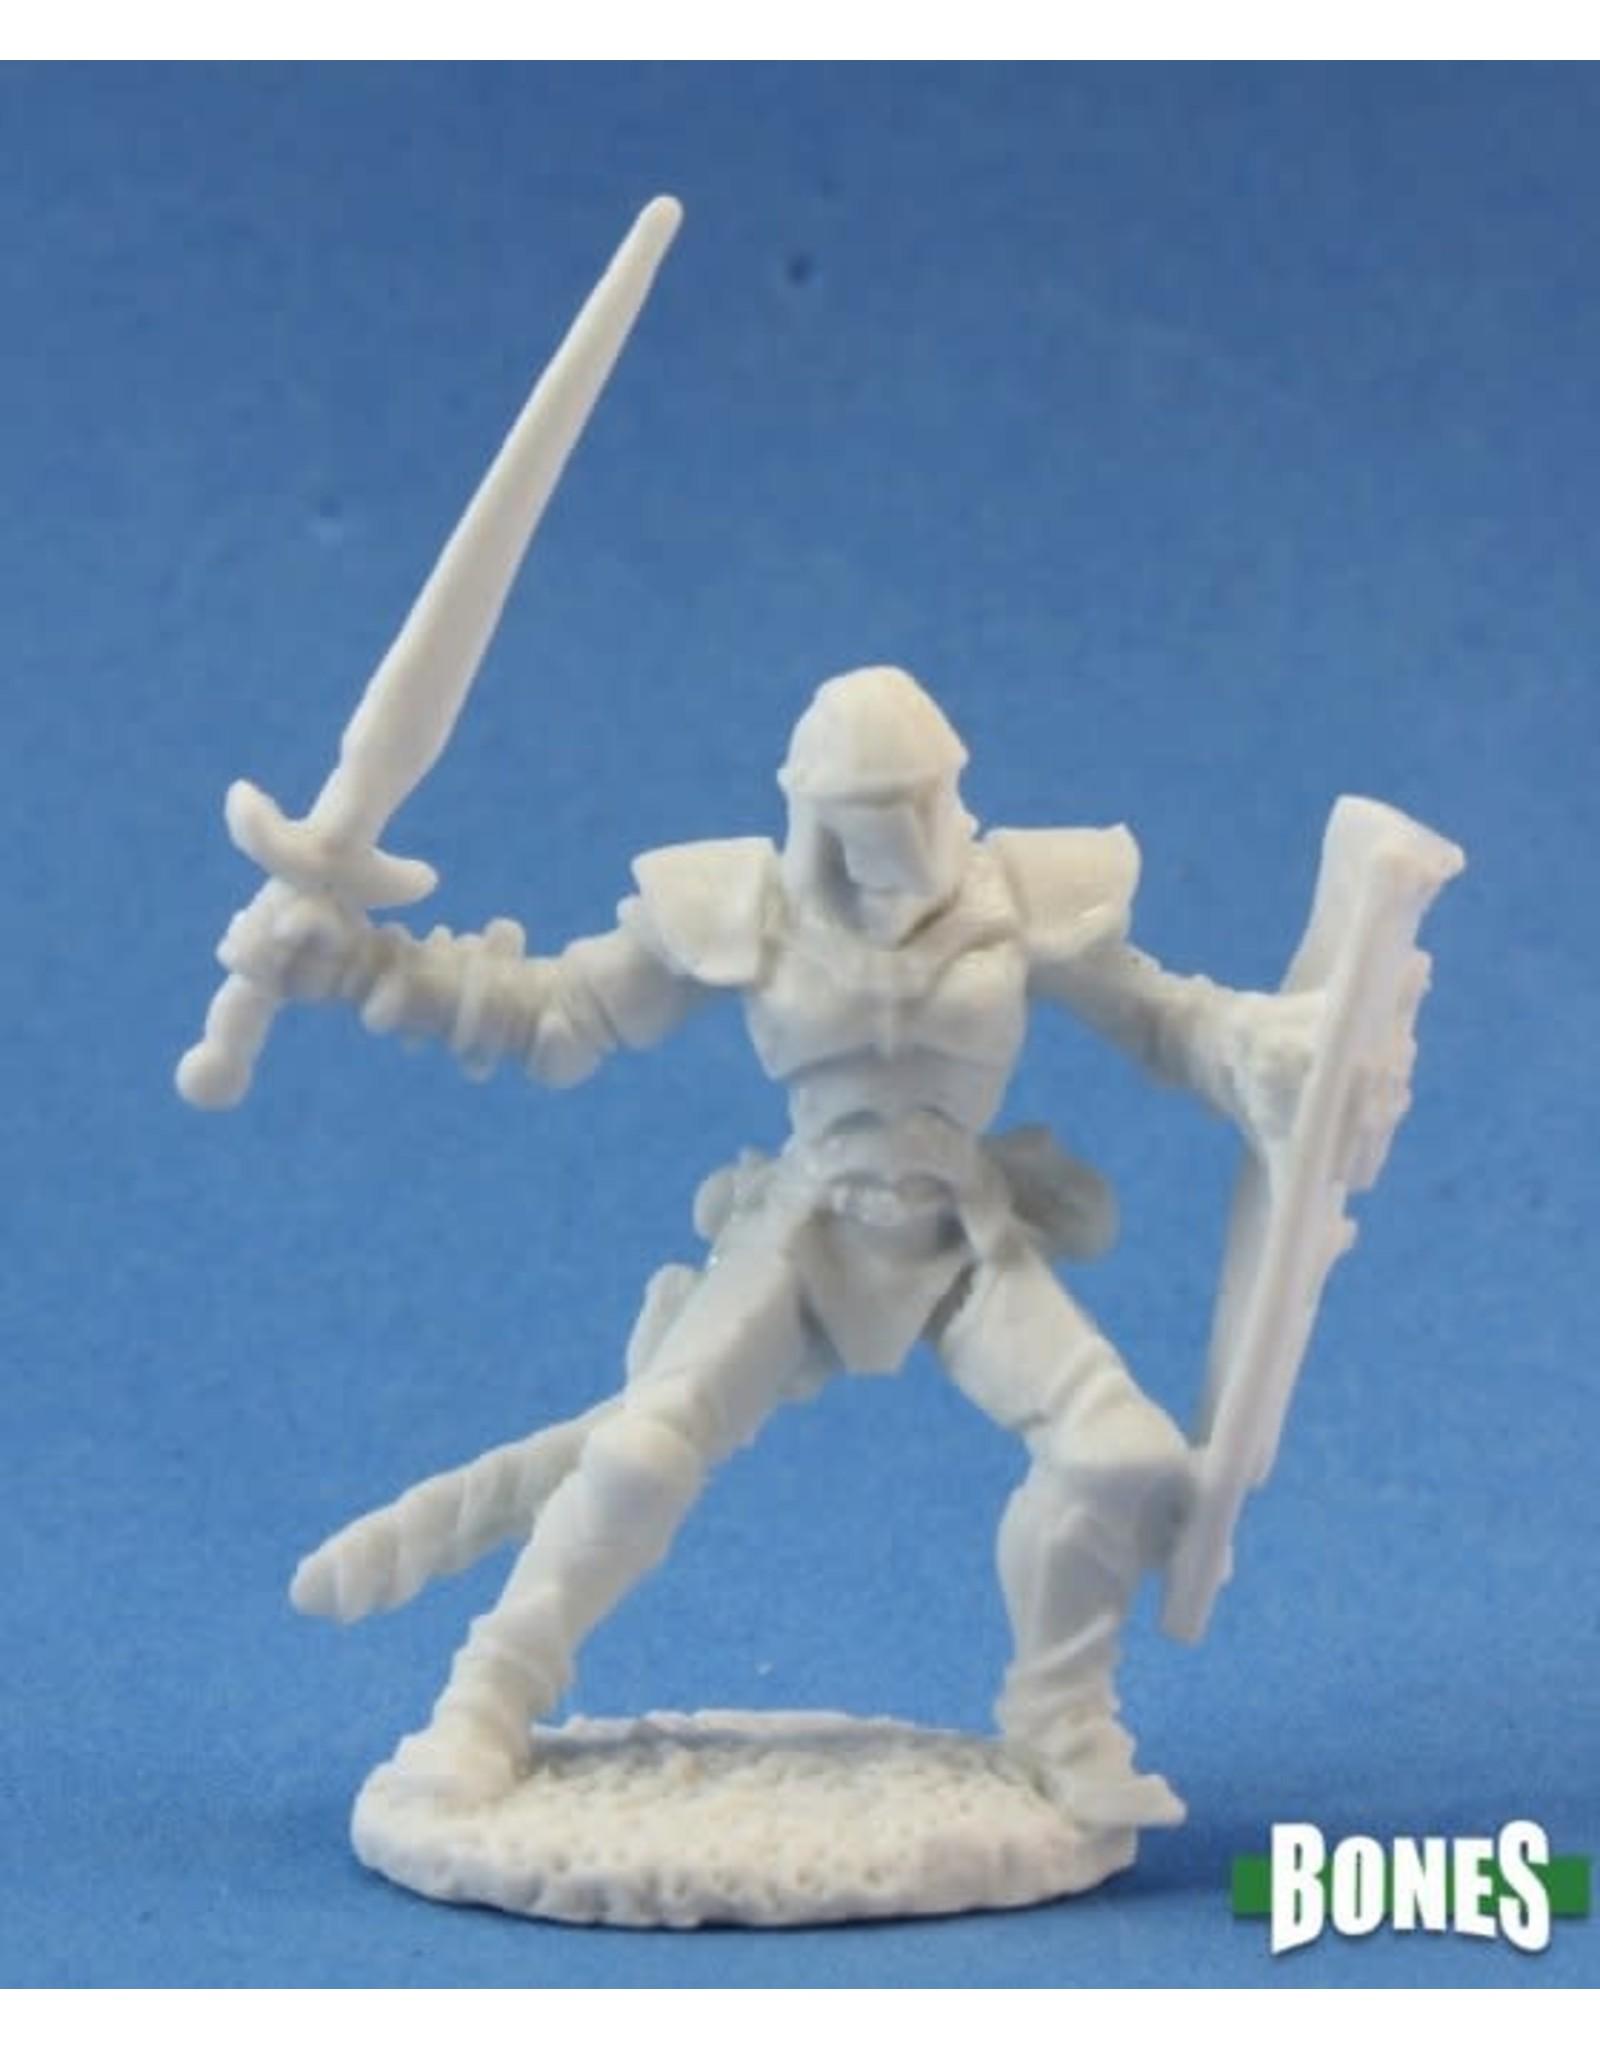 Reaper Miniatures Bones: Human Warrior Barnabas